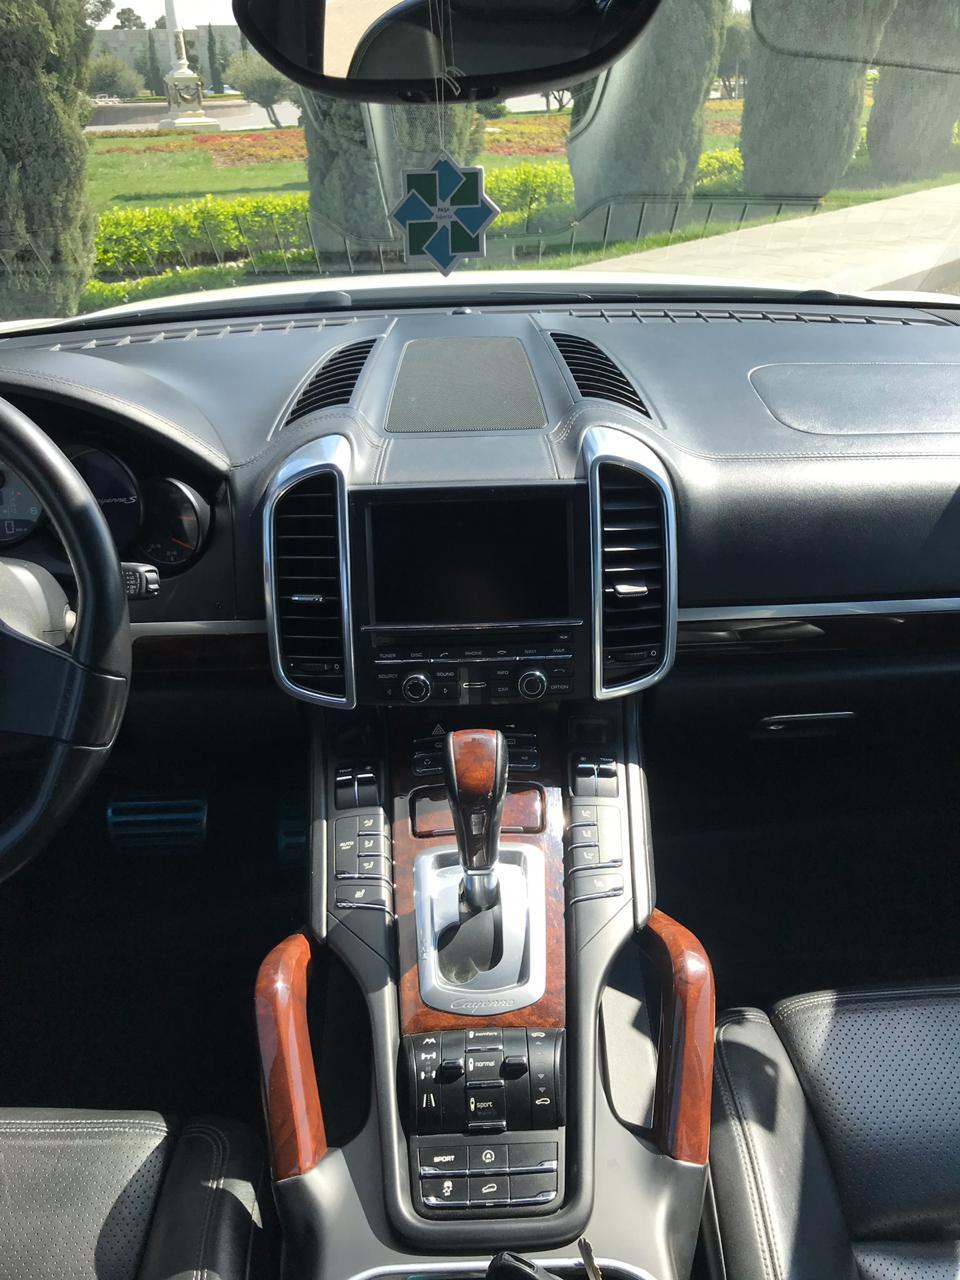 Porsche Cayenne 4.8(lt) 2011 İkinci əl  $40500